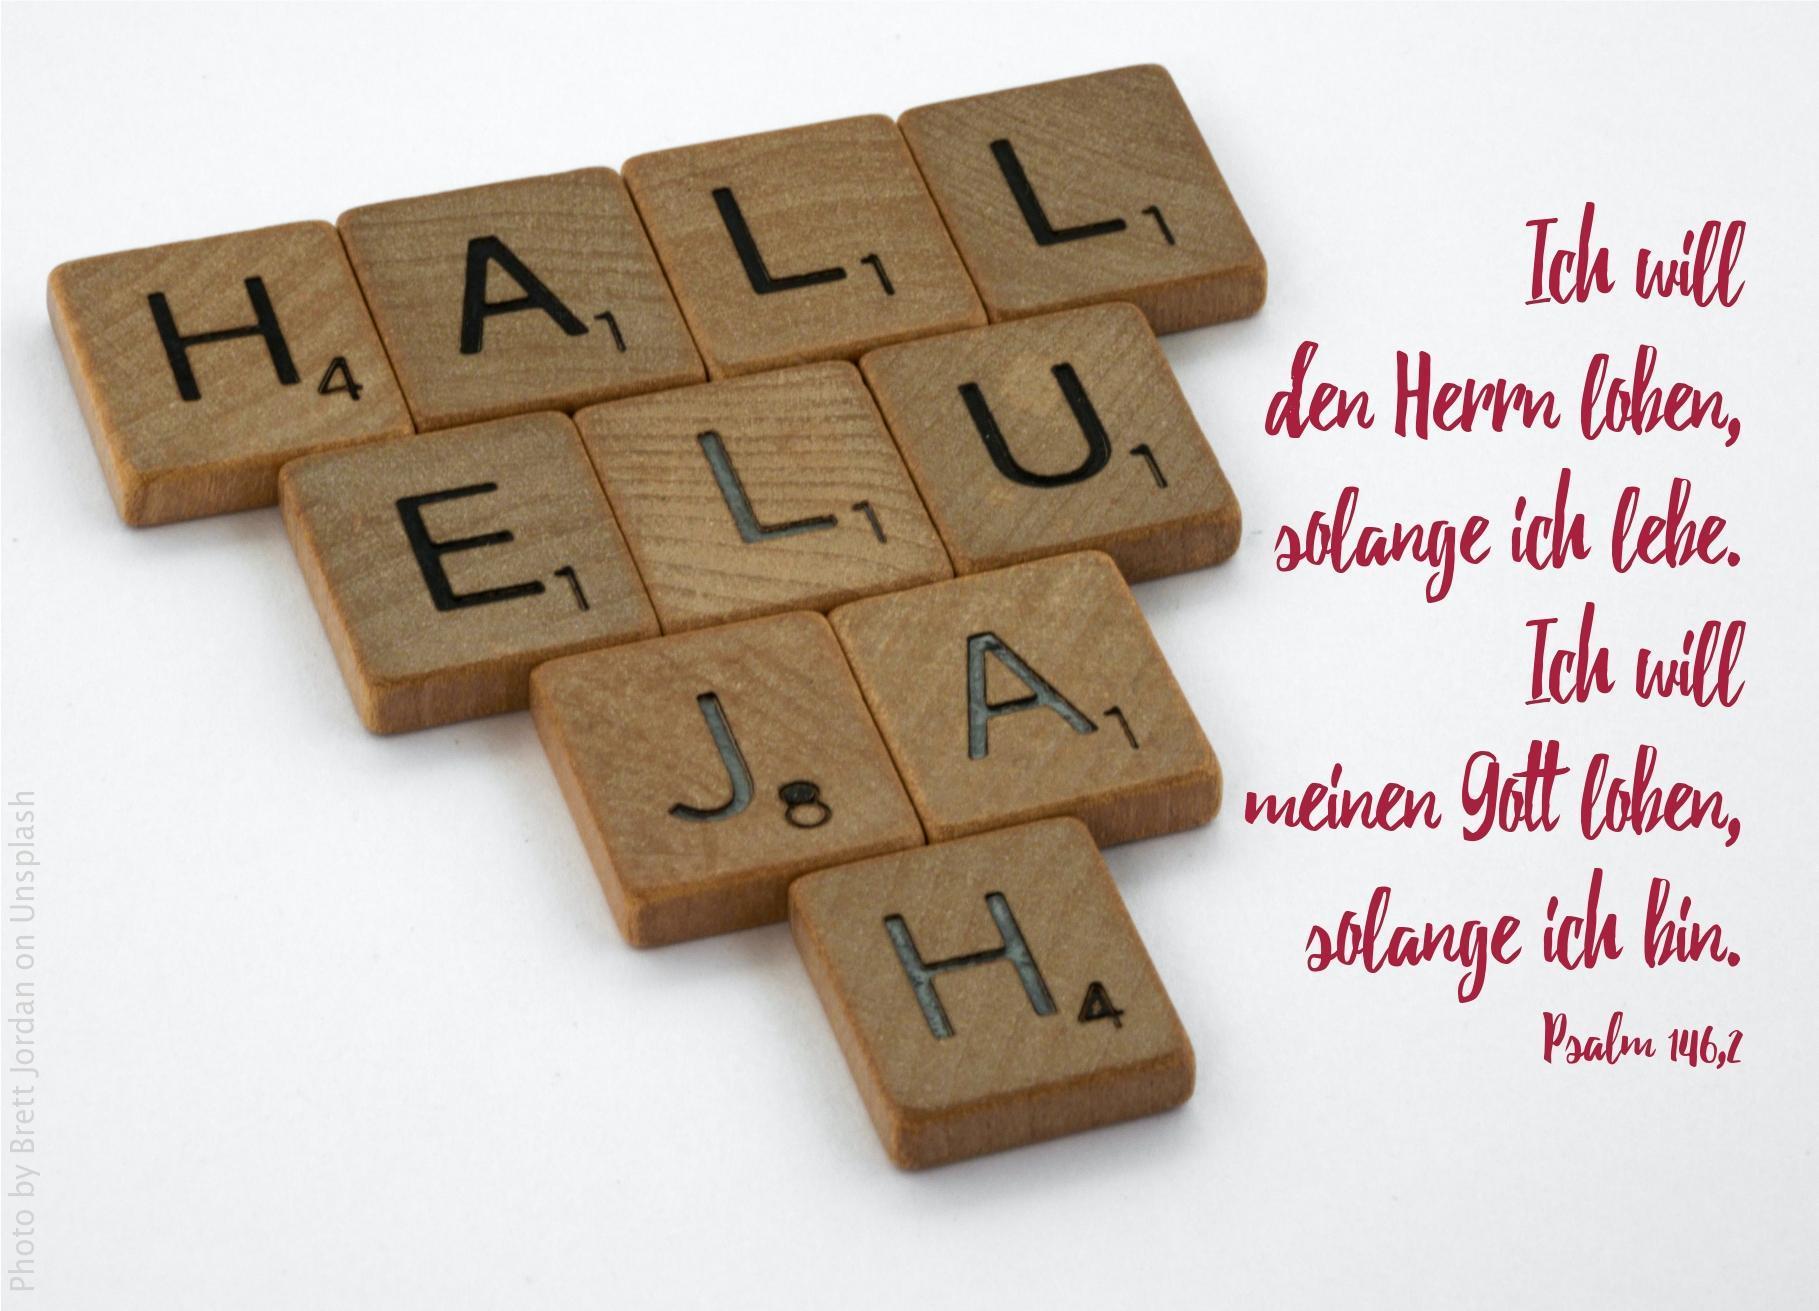 "alt=""scrabble_steine_hallelujah_erwartet_bibelhoerbuch_elisas_letzte_prophezeiung"""